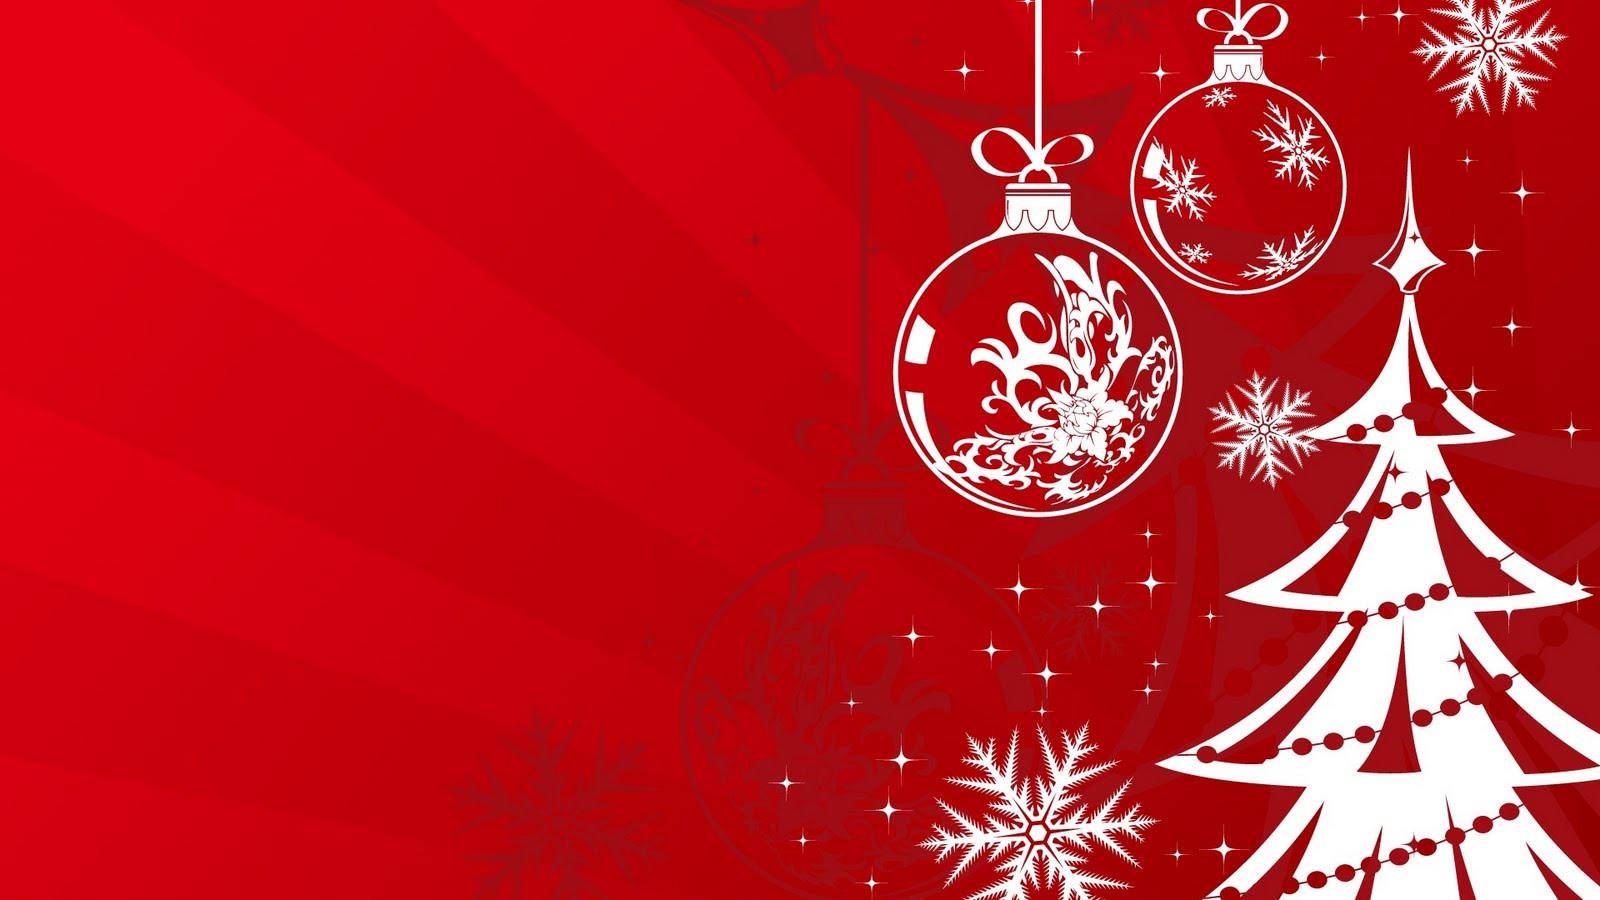 trololo blogg wallpaper kostenlos weihnachten. Black Bedroom Furniture Sets. Home Design Ideas